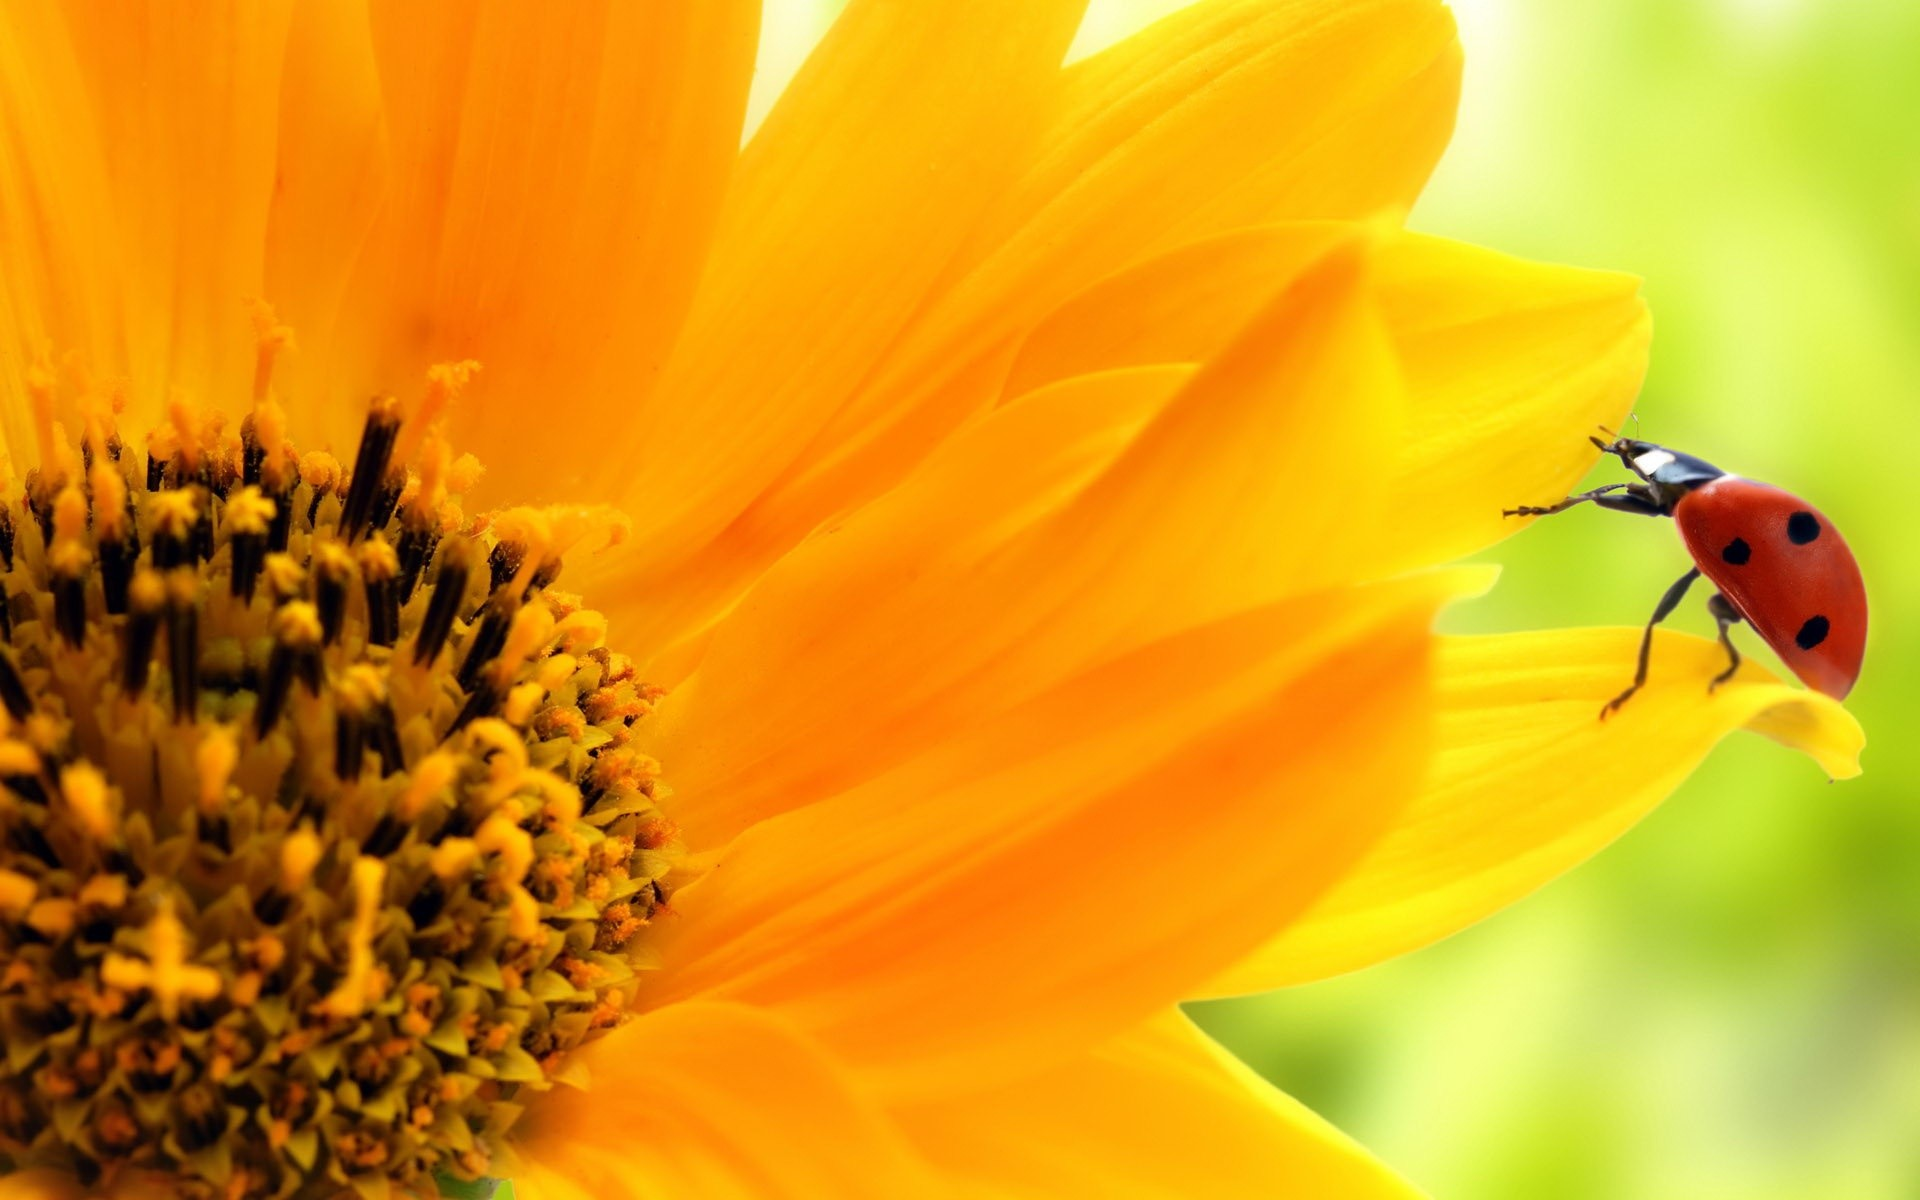 sunflower background tumblr